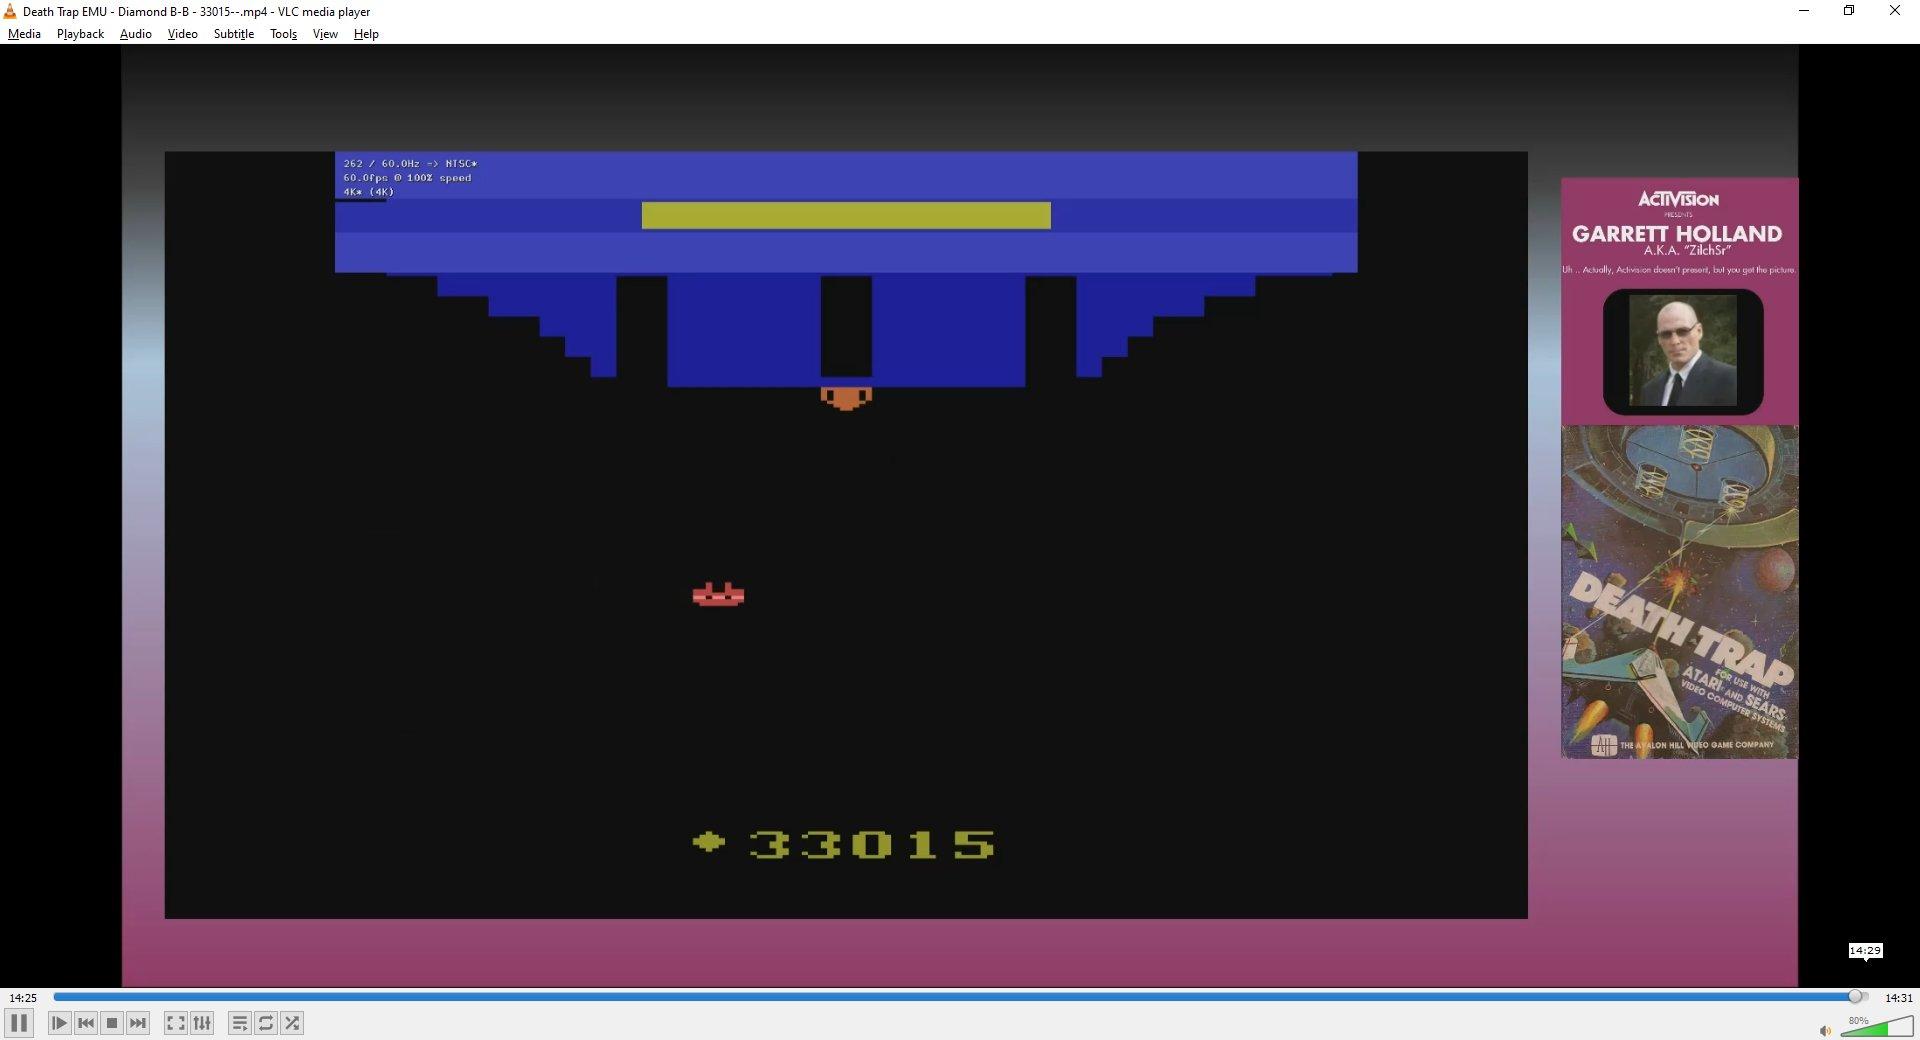 ZilchSr: Death Trap: Hard (Atari 2600 Emulated) 33,015 points on 2021-01-02 20:32:17